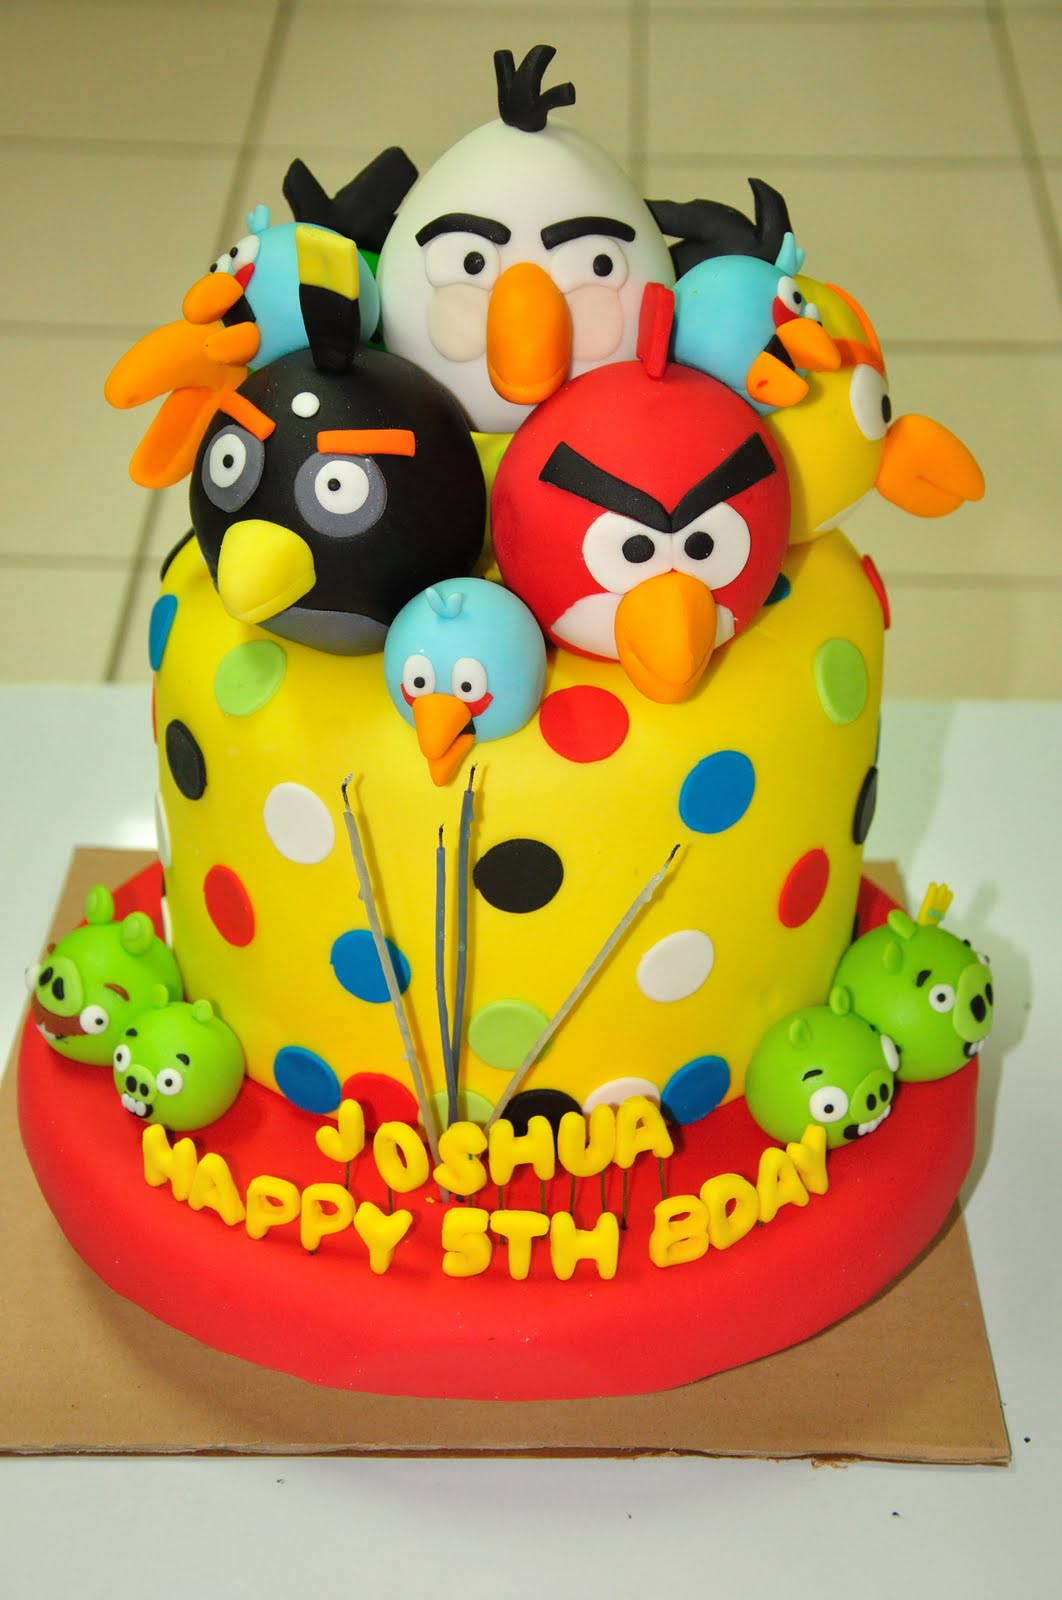 Tremendous 11 Anger Bird Birthday Cakes Photo Angry Bird Idea Birthday Cake Funny Birthday Cards Online Sheoxdamsfinfo